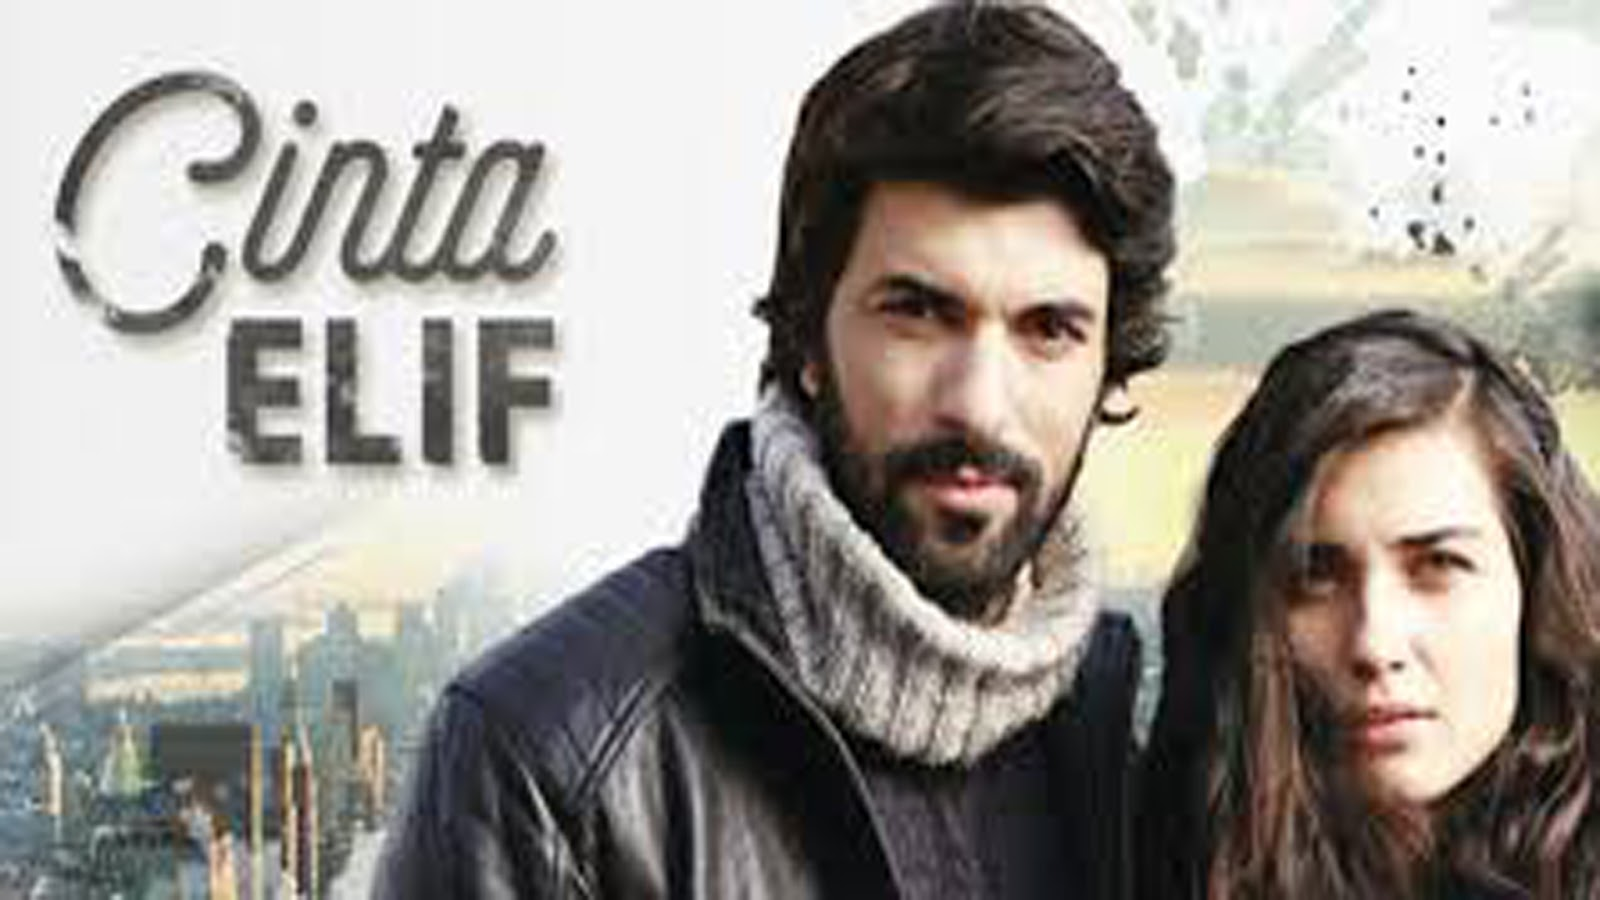 Cinta Elif ANTV Series: Download Cinta Elif ANTV Series